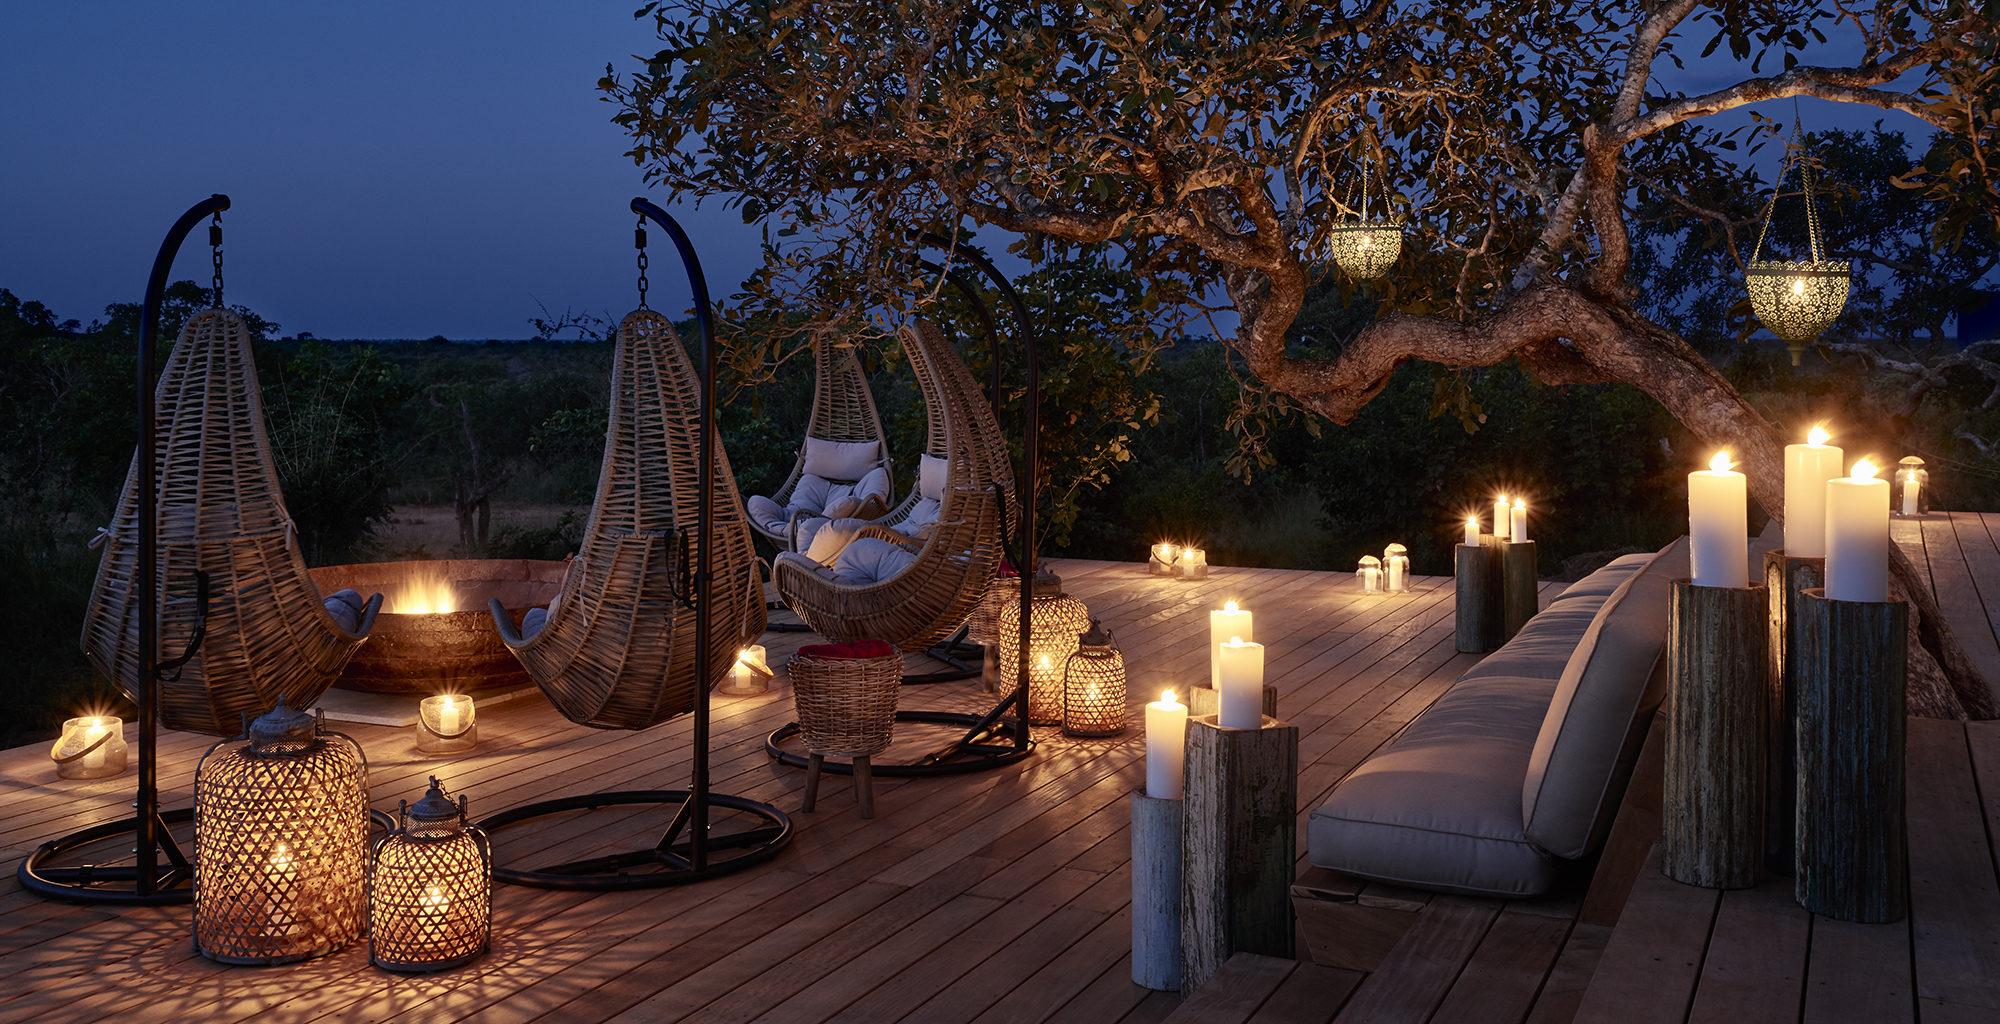 South-Africa-Farmstead-Deck-Night